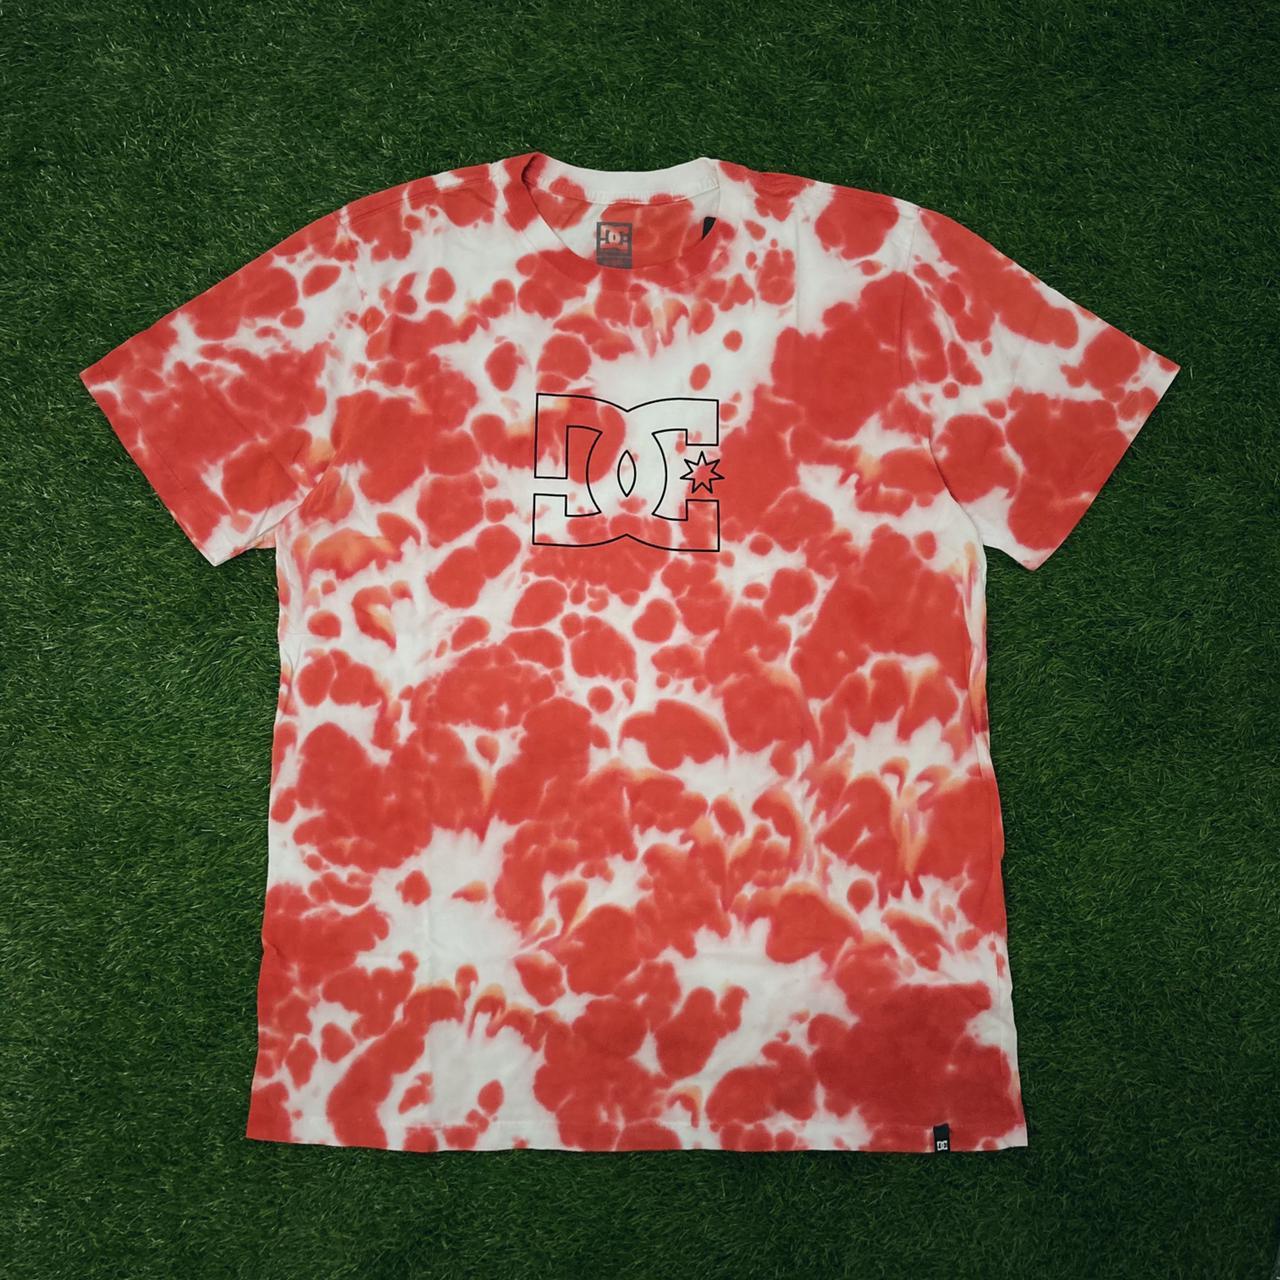 Camiseta dc cloudy tie dye red